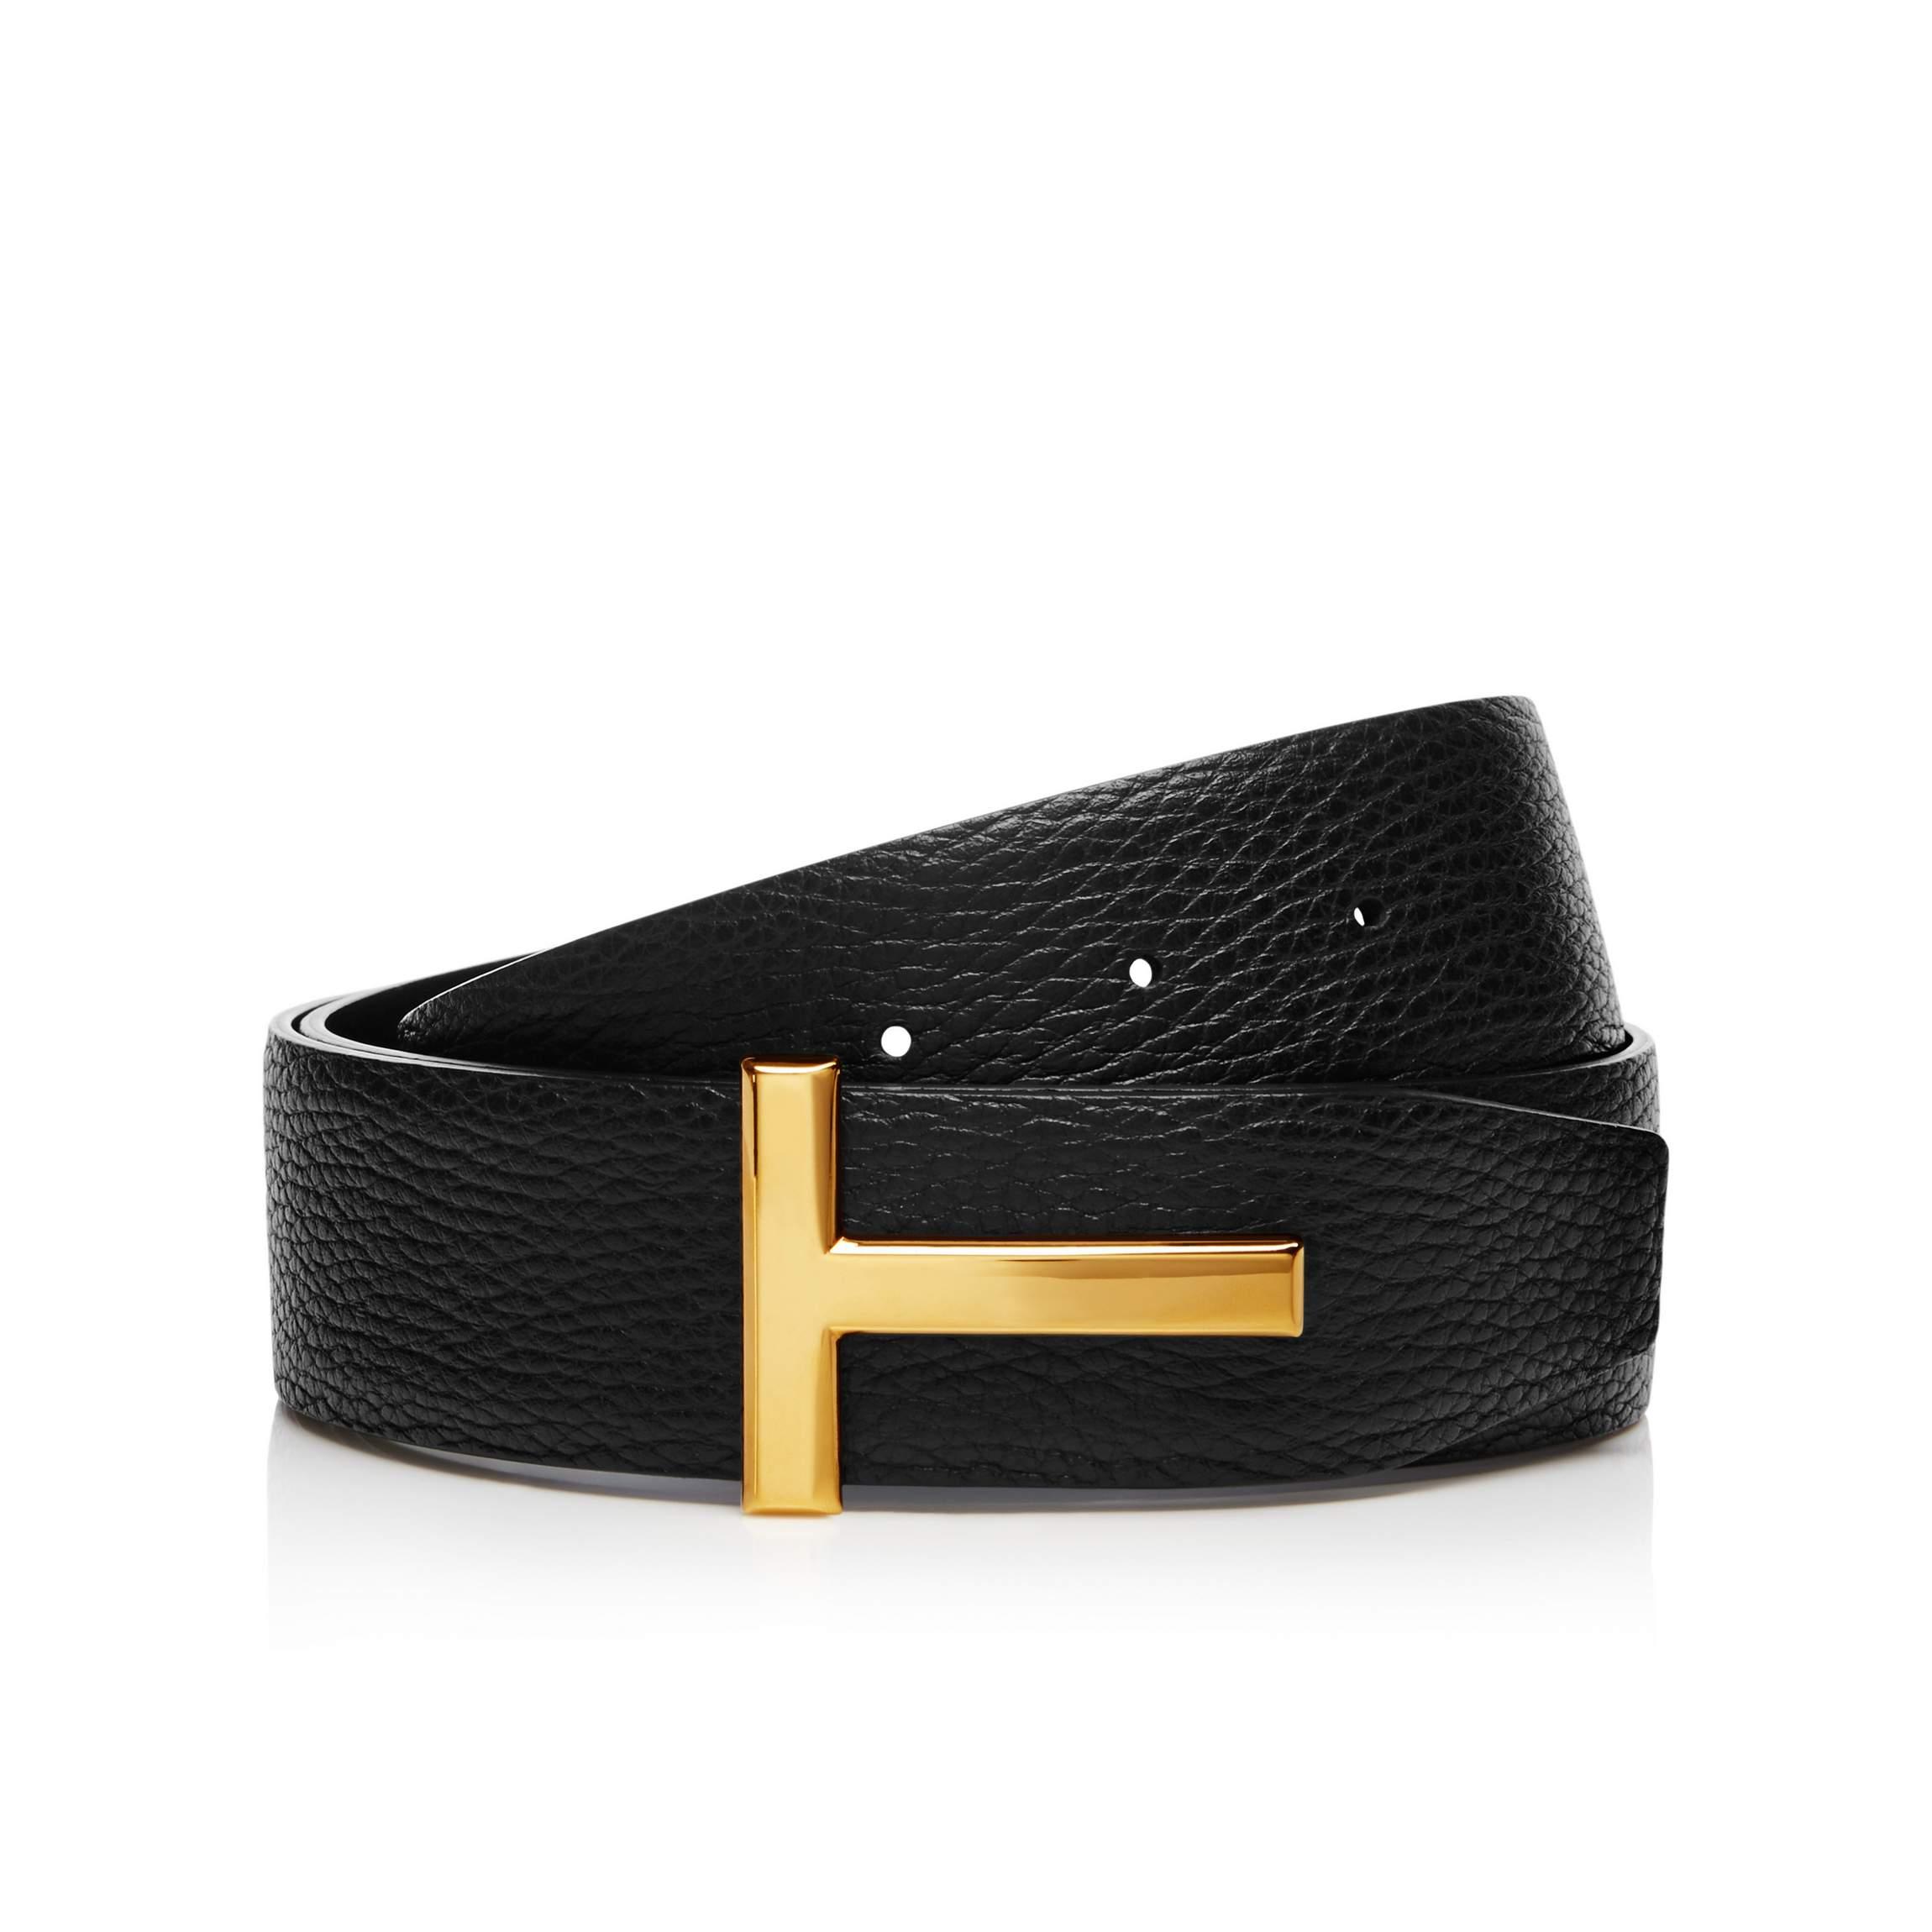 W2c Tom Ford Belt Fashionreps